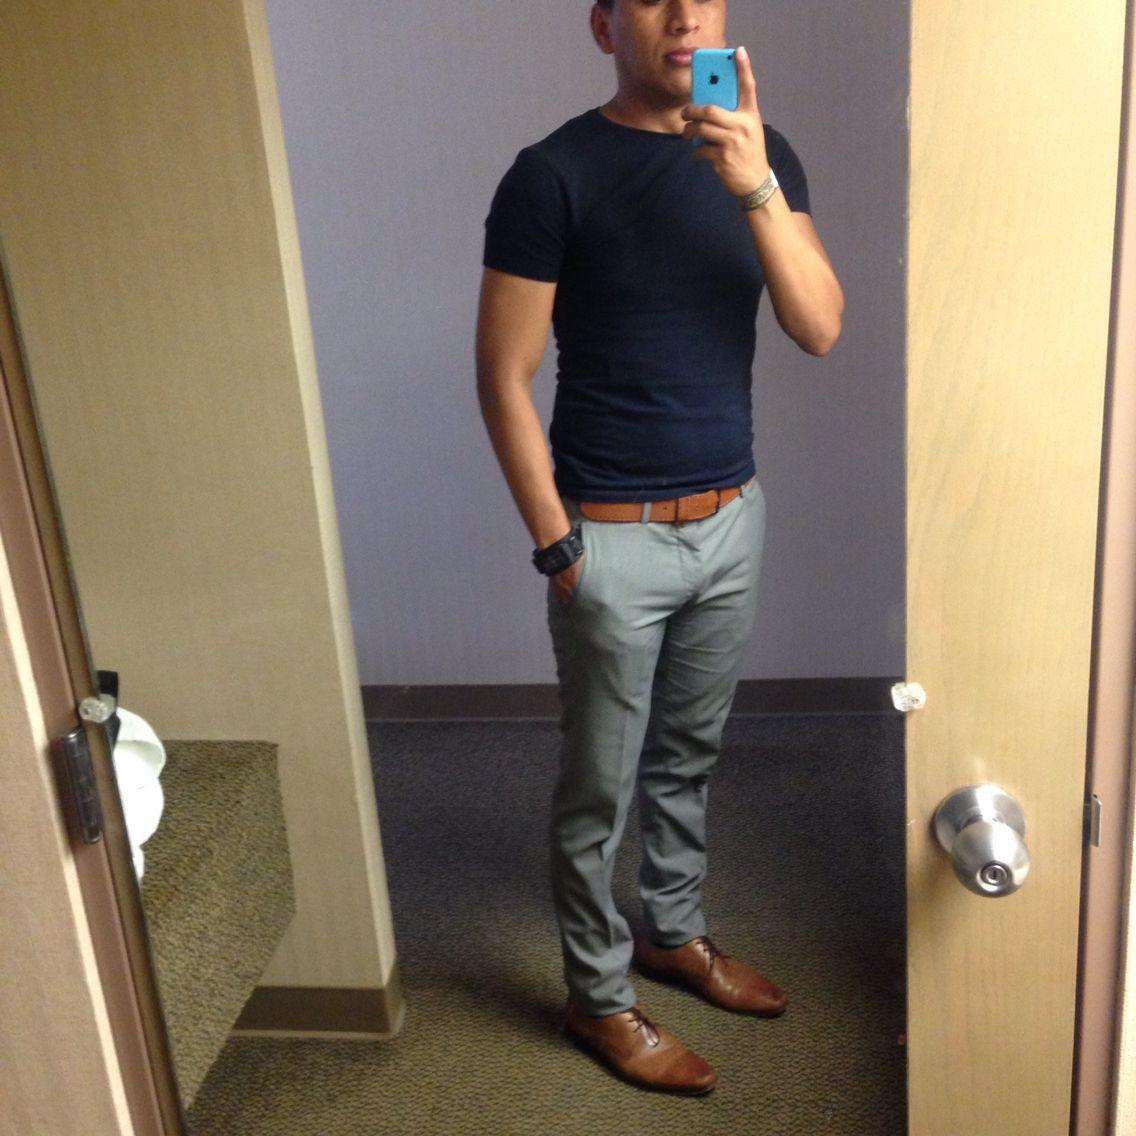 Playera azul , pantalón gris , cinturón y zapatos cafés